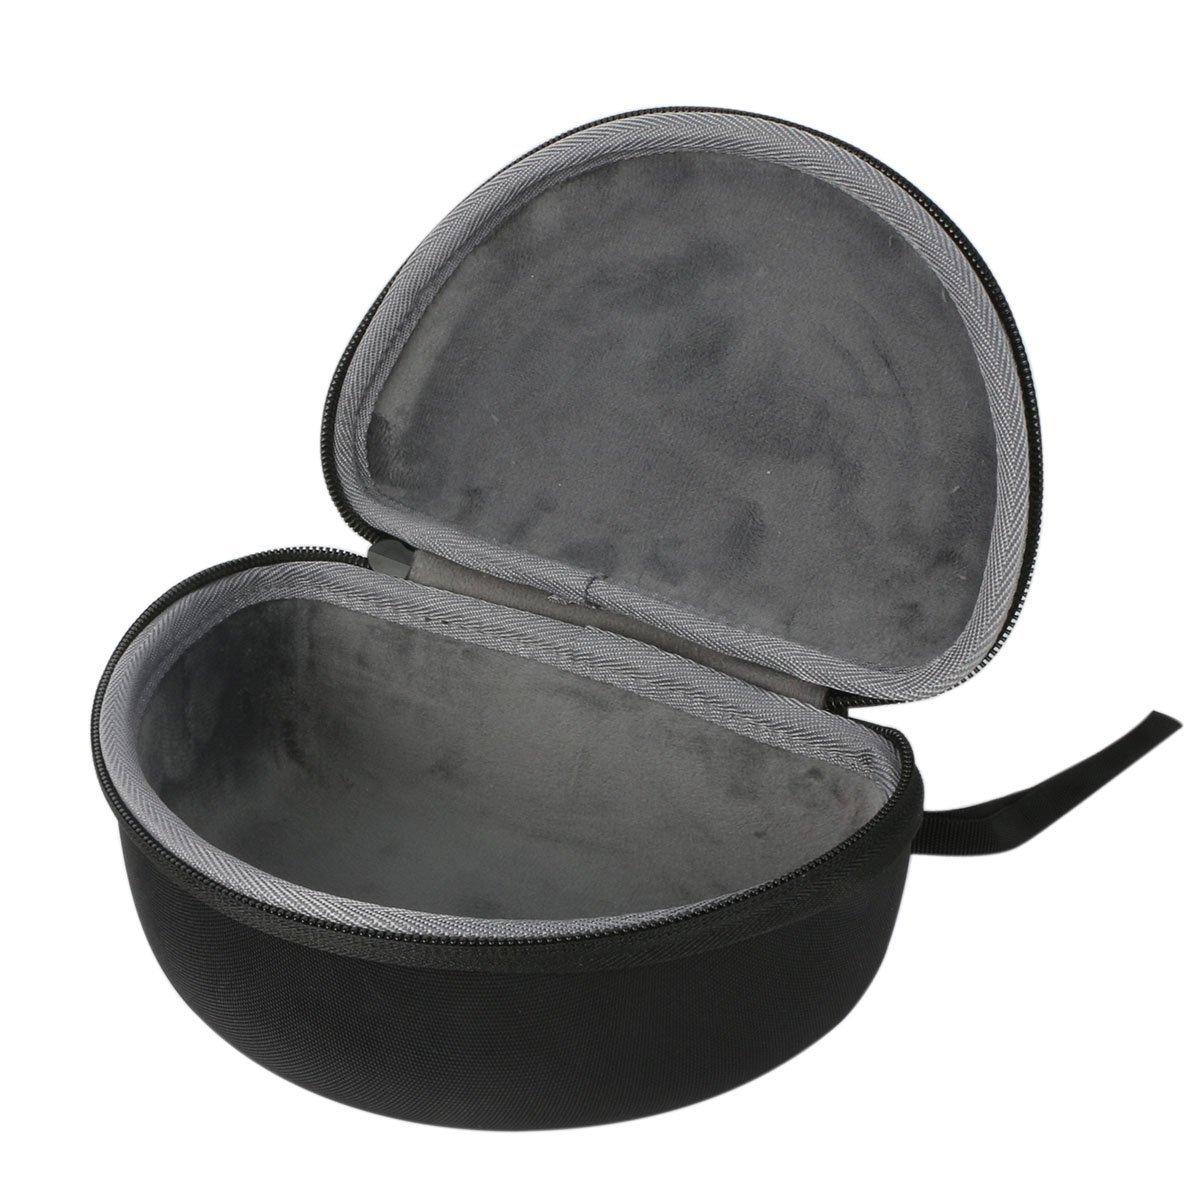 Co2Crea Hard Travel Case for DEWALT DPG82-11 Concealer Clear Anti-Fog Dual Mold Safety Goggle